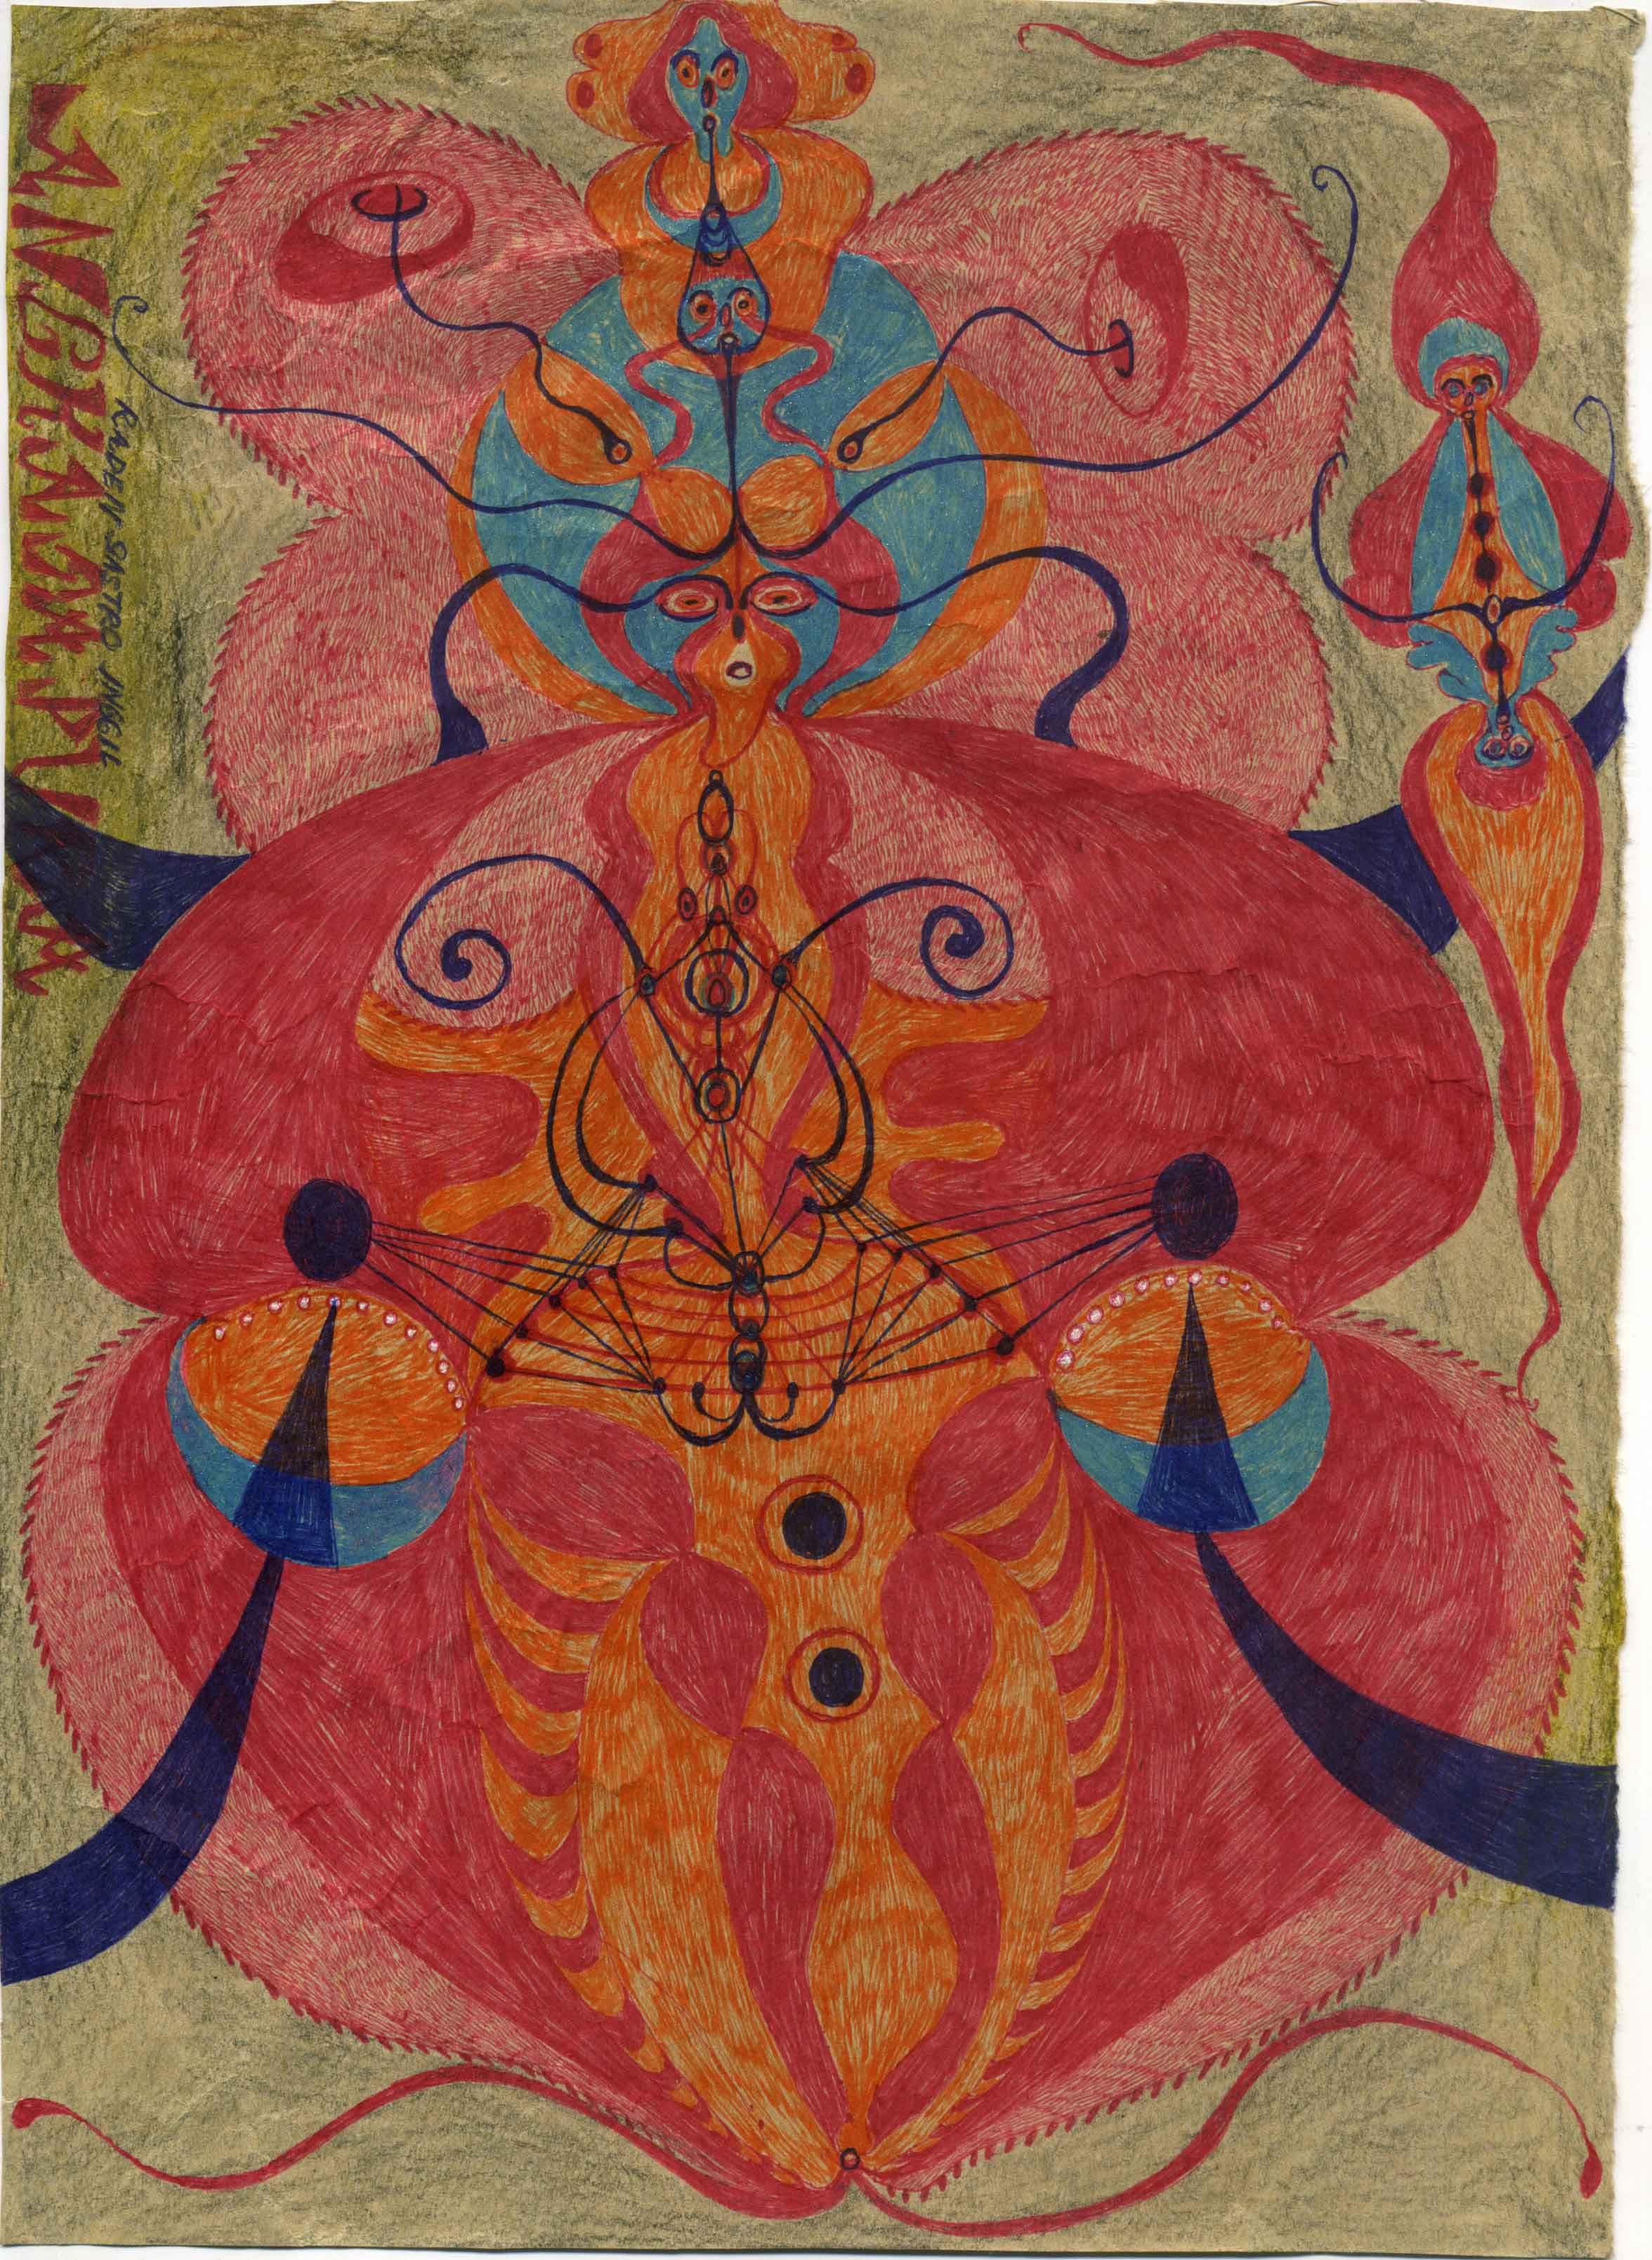 Noviadi Angkasapura    Untitled  , 2015 Ball point pen, glitter, crayon on paper 10.7 x 7.8 inches 27.2 x 19.8 cm NoA 171